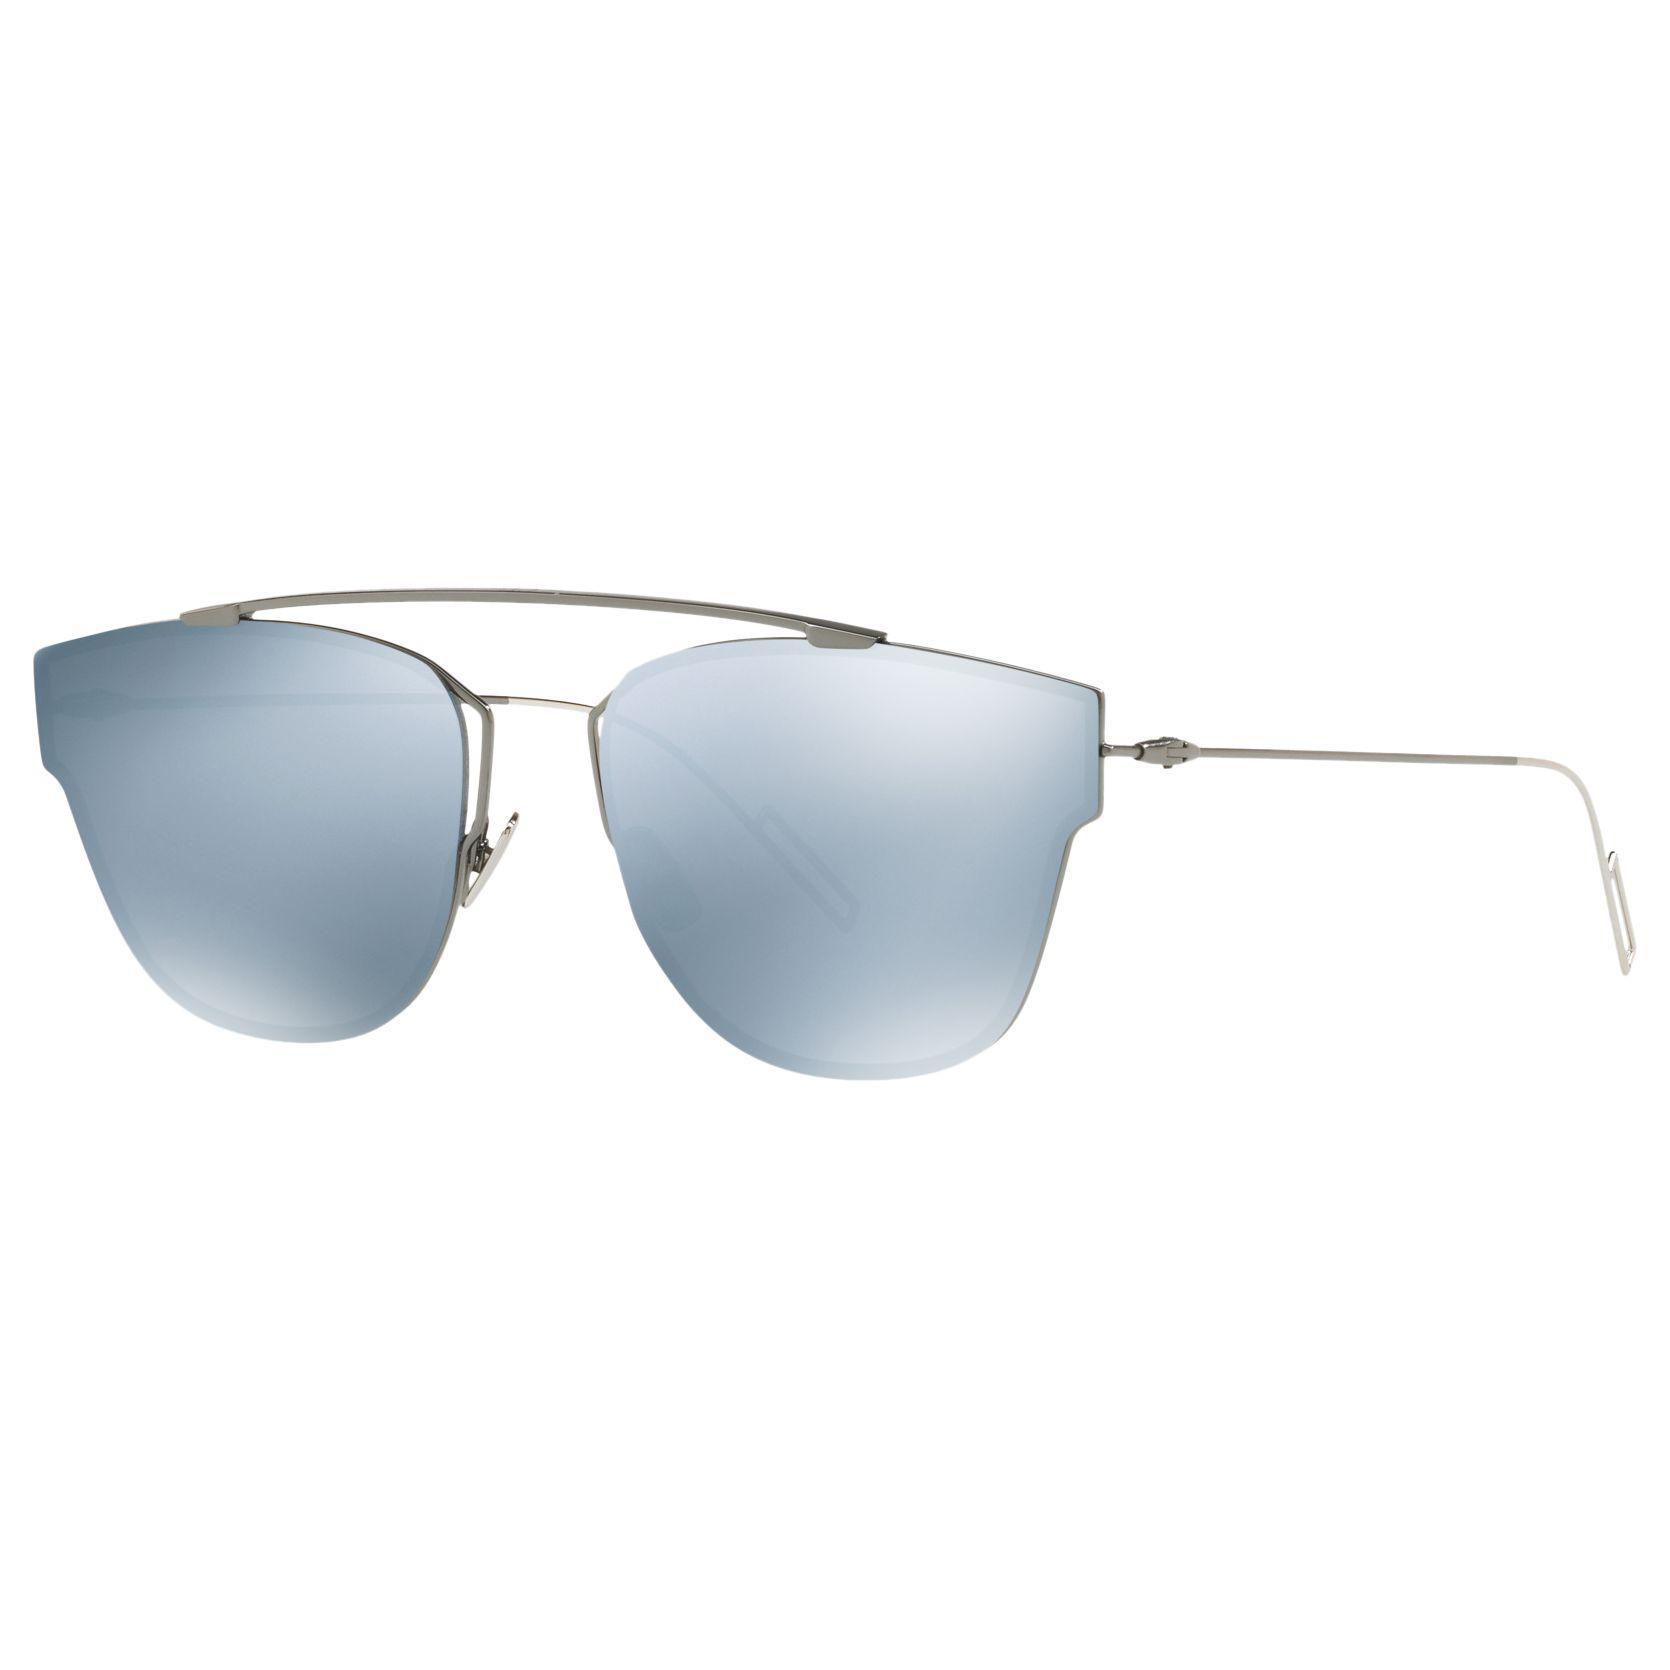 6f295f079322 Dior 0204s Aviator Sunglasses for Men - Lyst